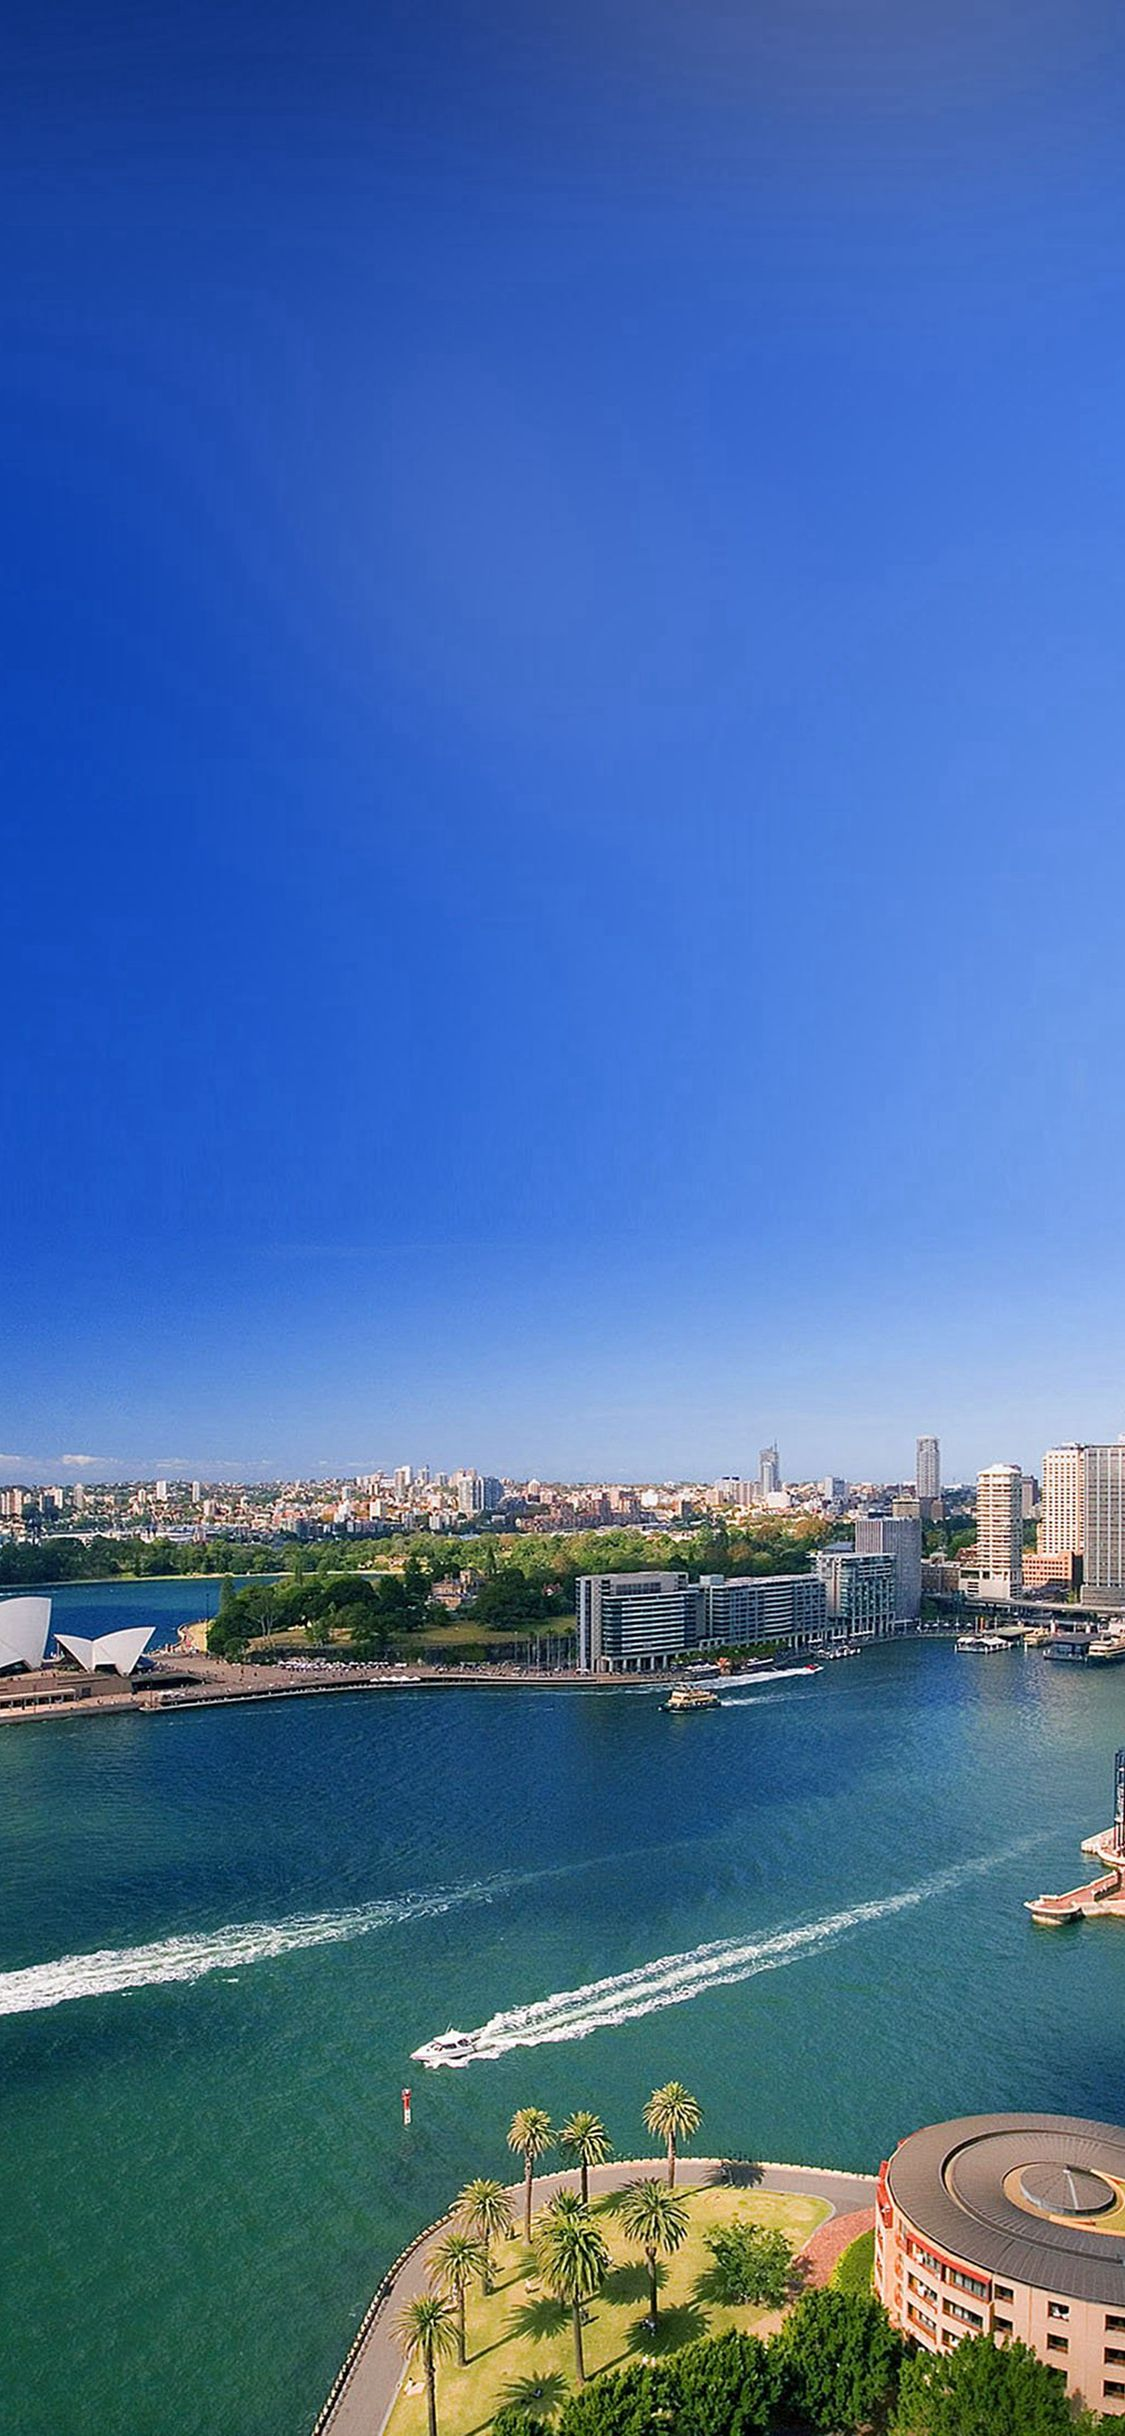 Australia Landscape City iPhone X wallpaper